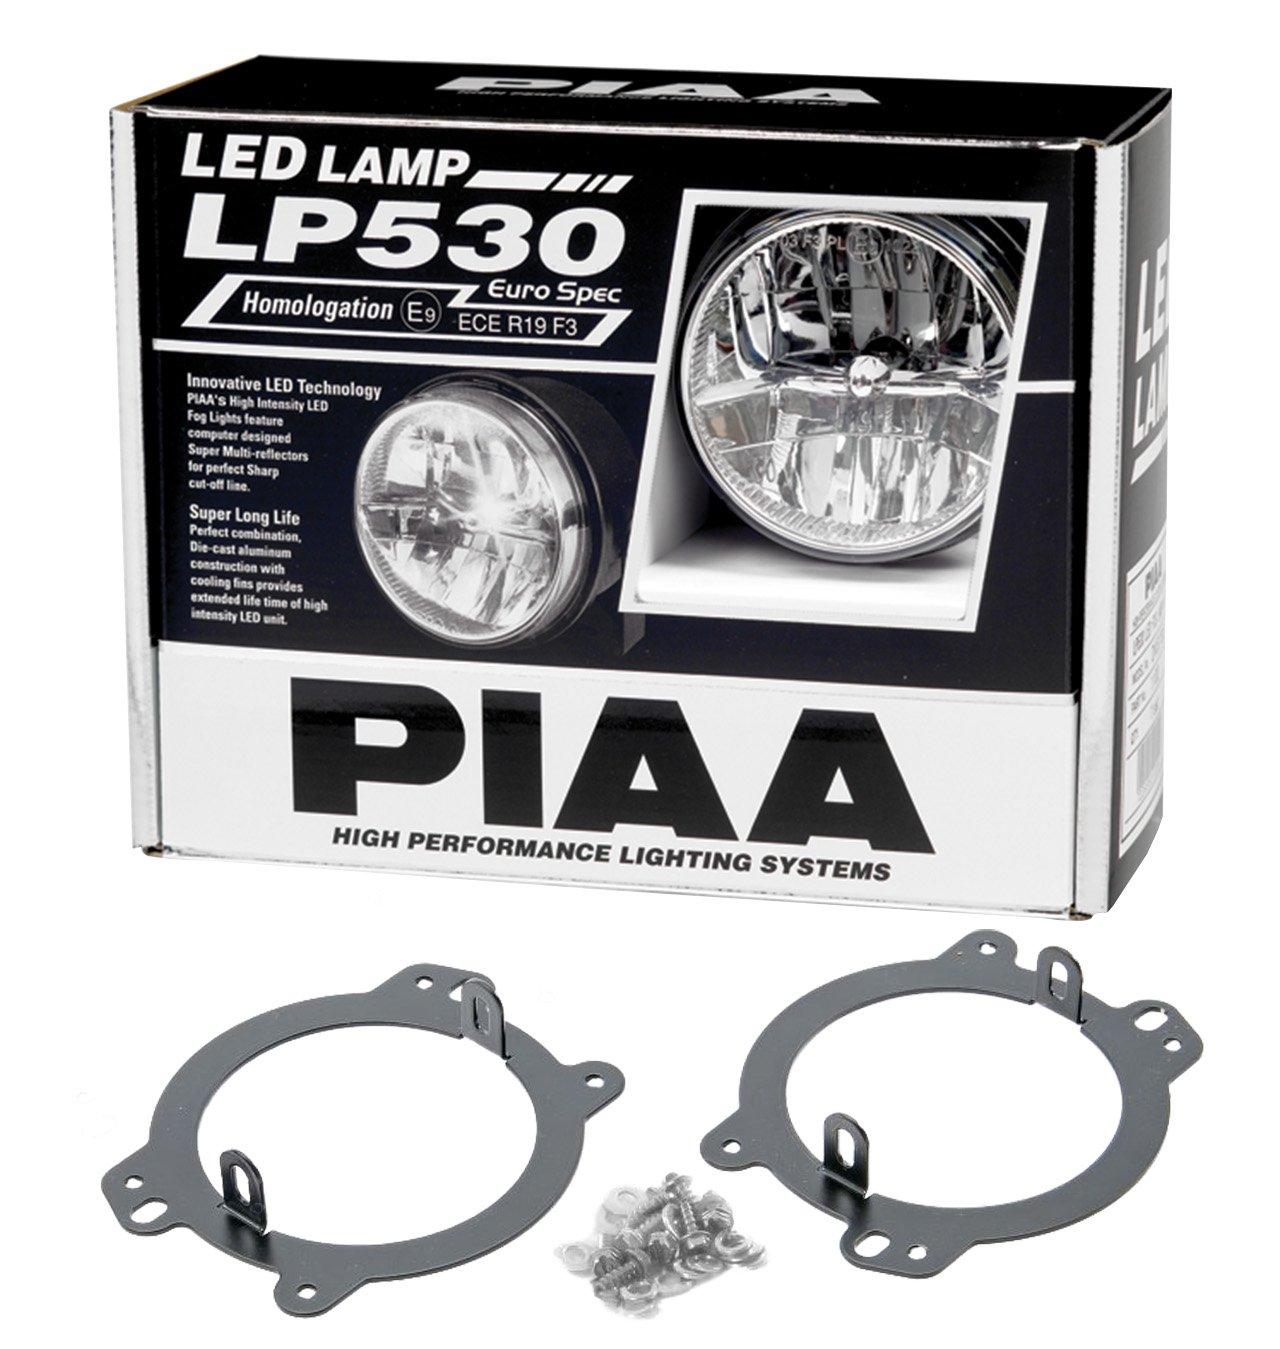 Amazon.com: PIAA 05332 Jeep Wrangler JK 2010+ LP530 LED Driving Light VSK  For OEM Location: Automotive